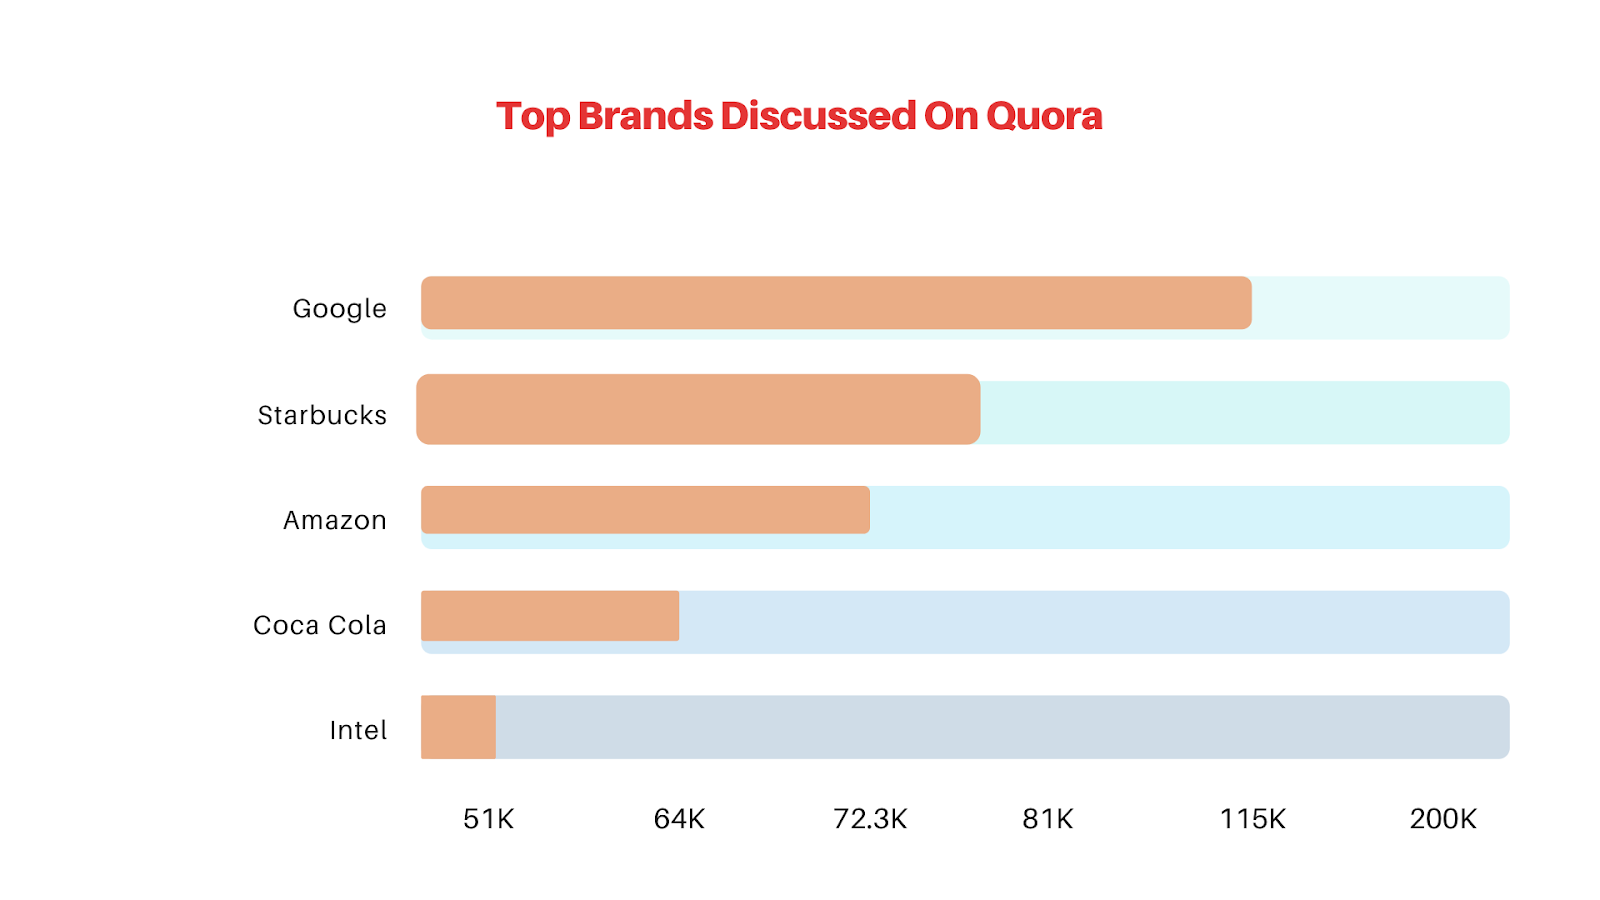 Most discussed brands on quora